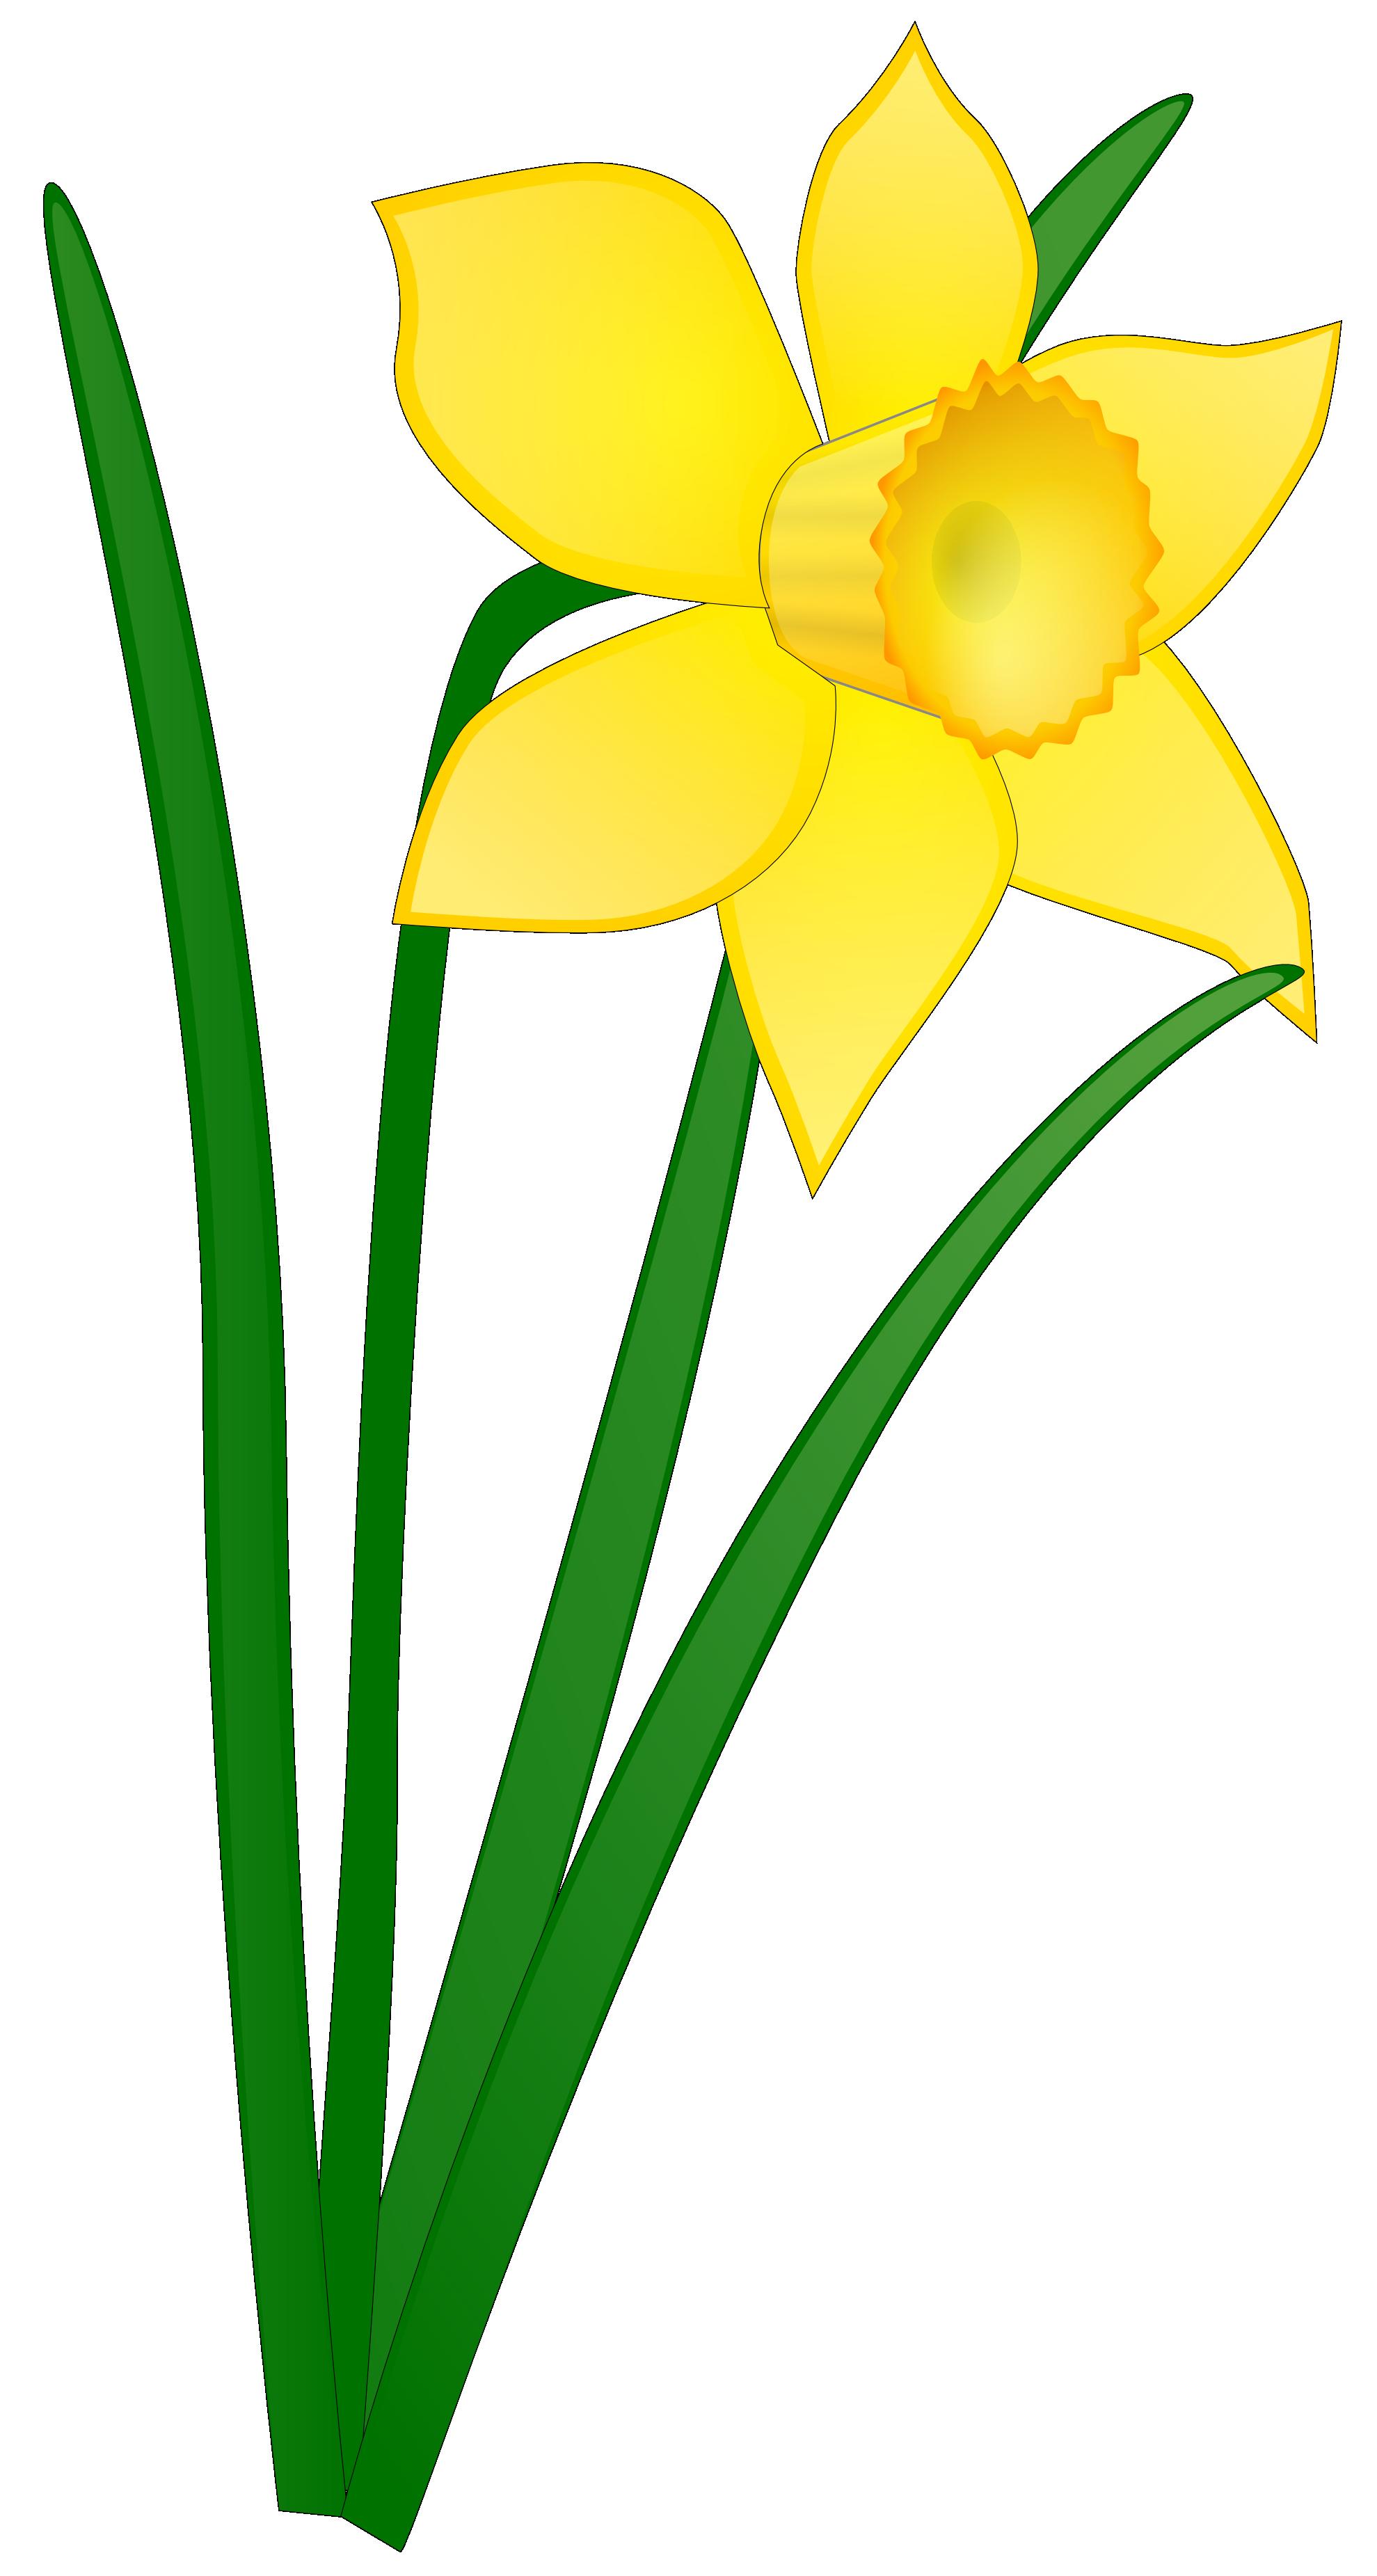 Flower clip art panda. Daffodil clipart botanical illustration